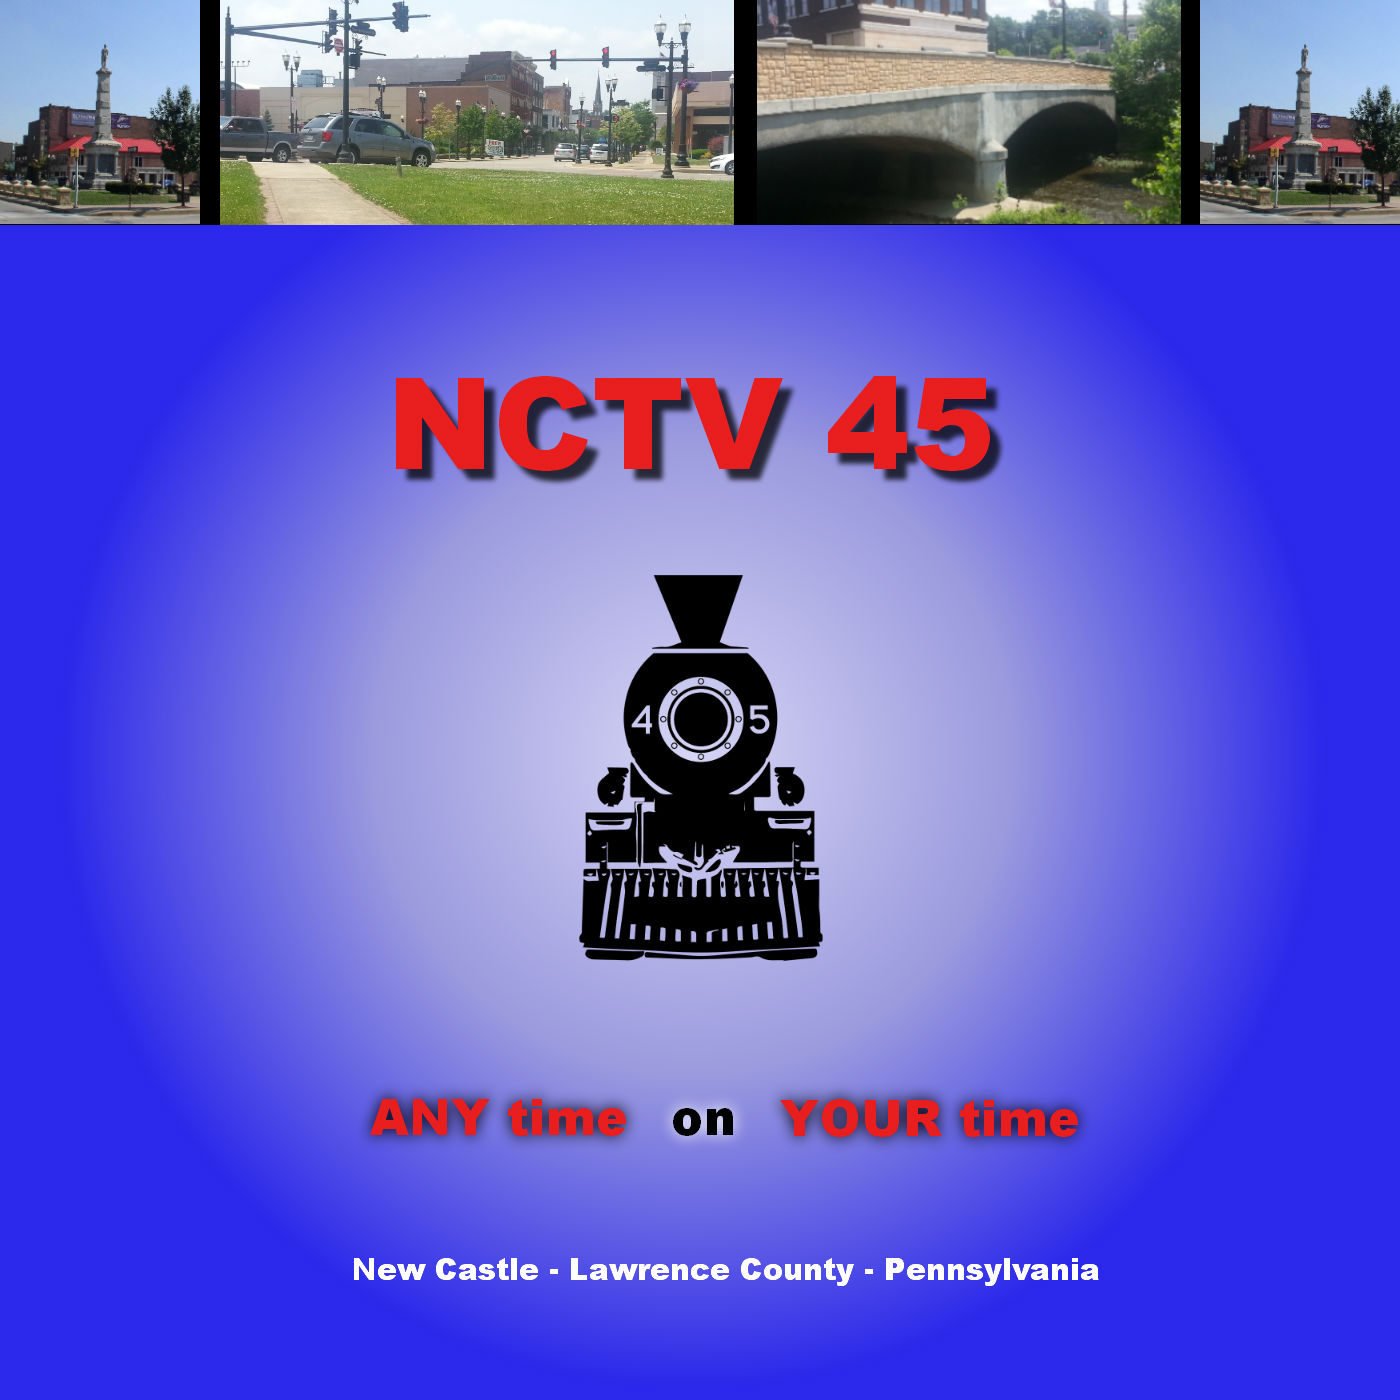 Artwork for NCTV45's Lawrence County Community Happenings February 17 Thru Feb 23 2019